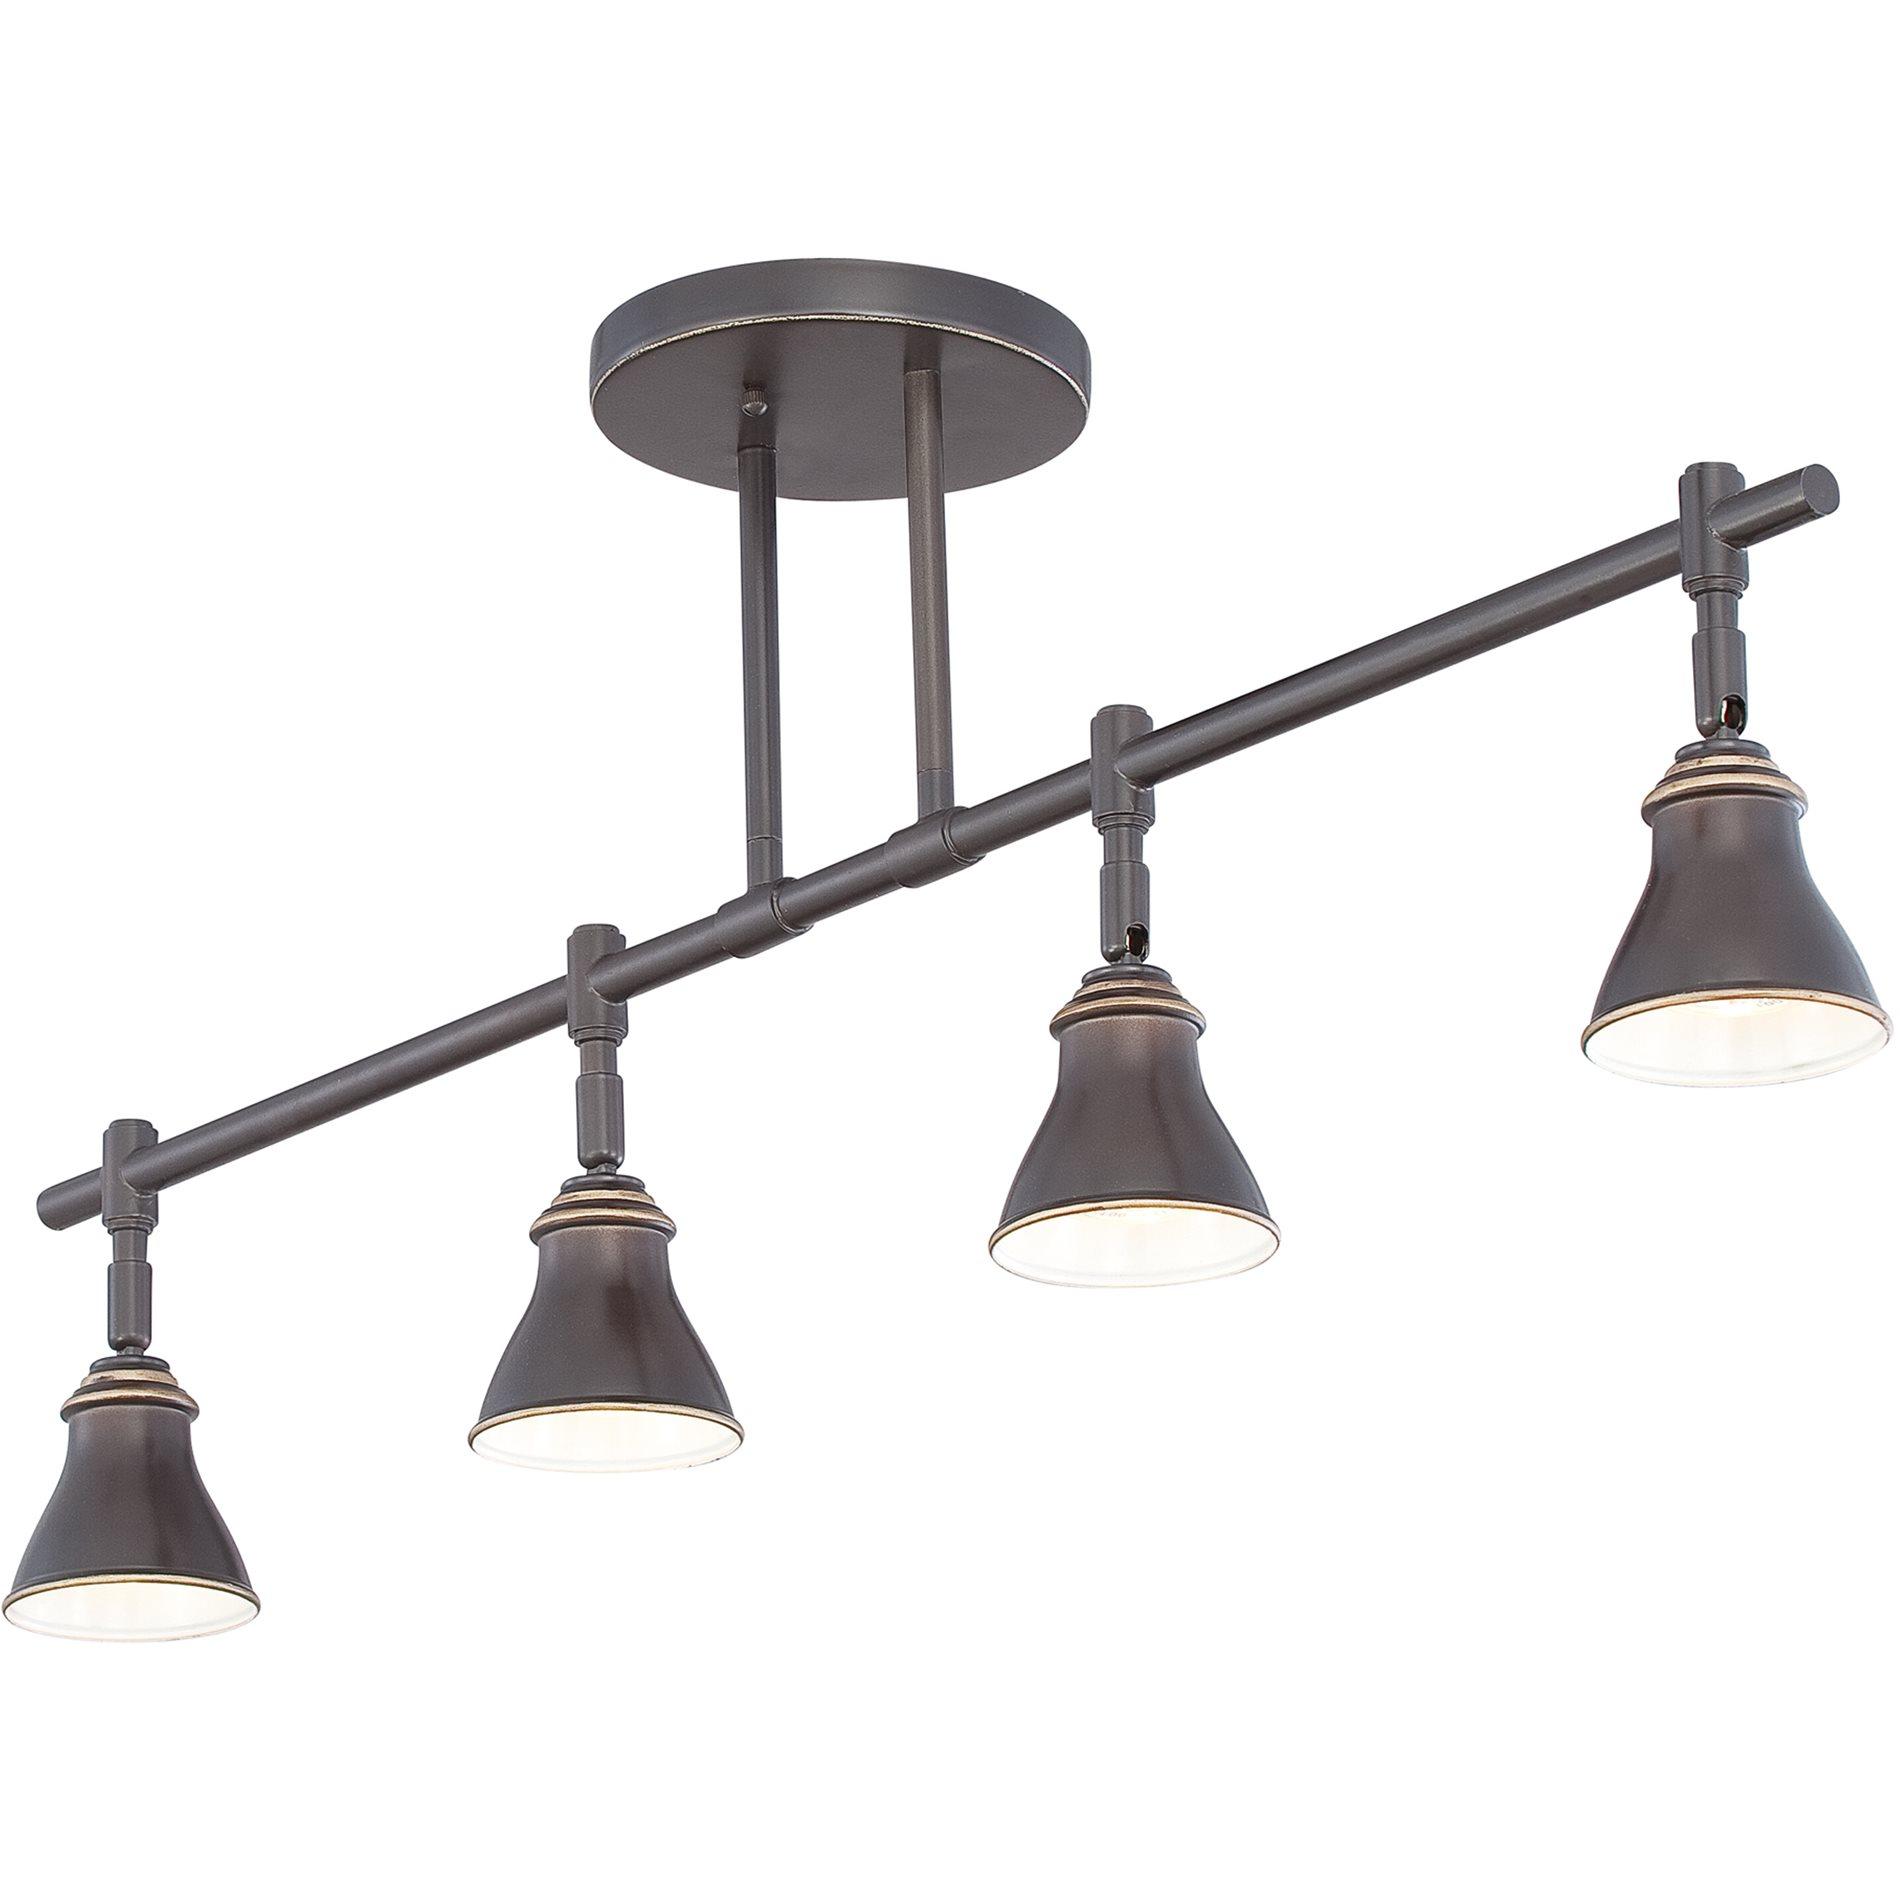 Quoizel qtr10054pn contemporary ceiling track light qz for Ceiling track light fixtures